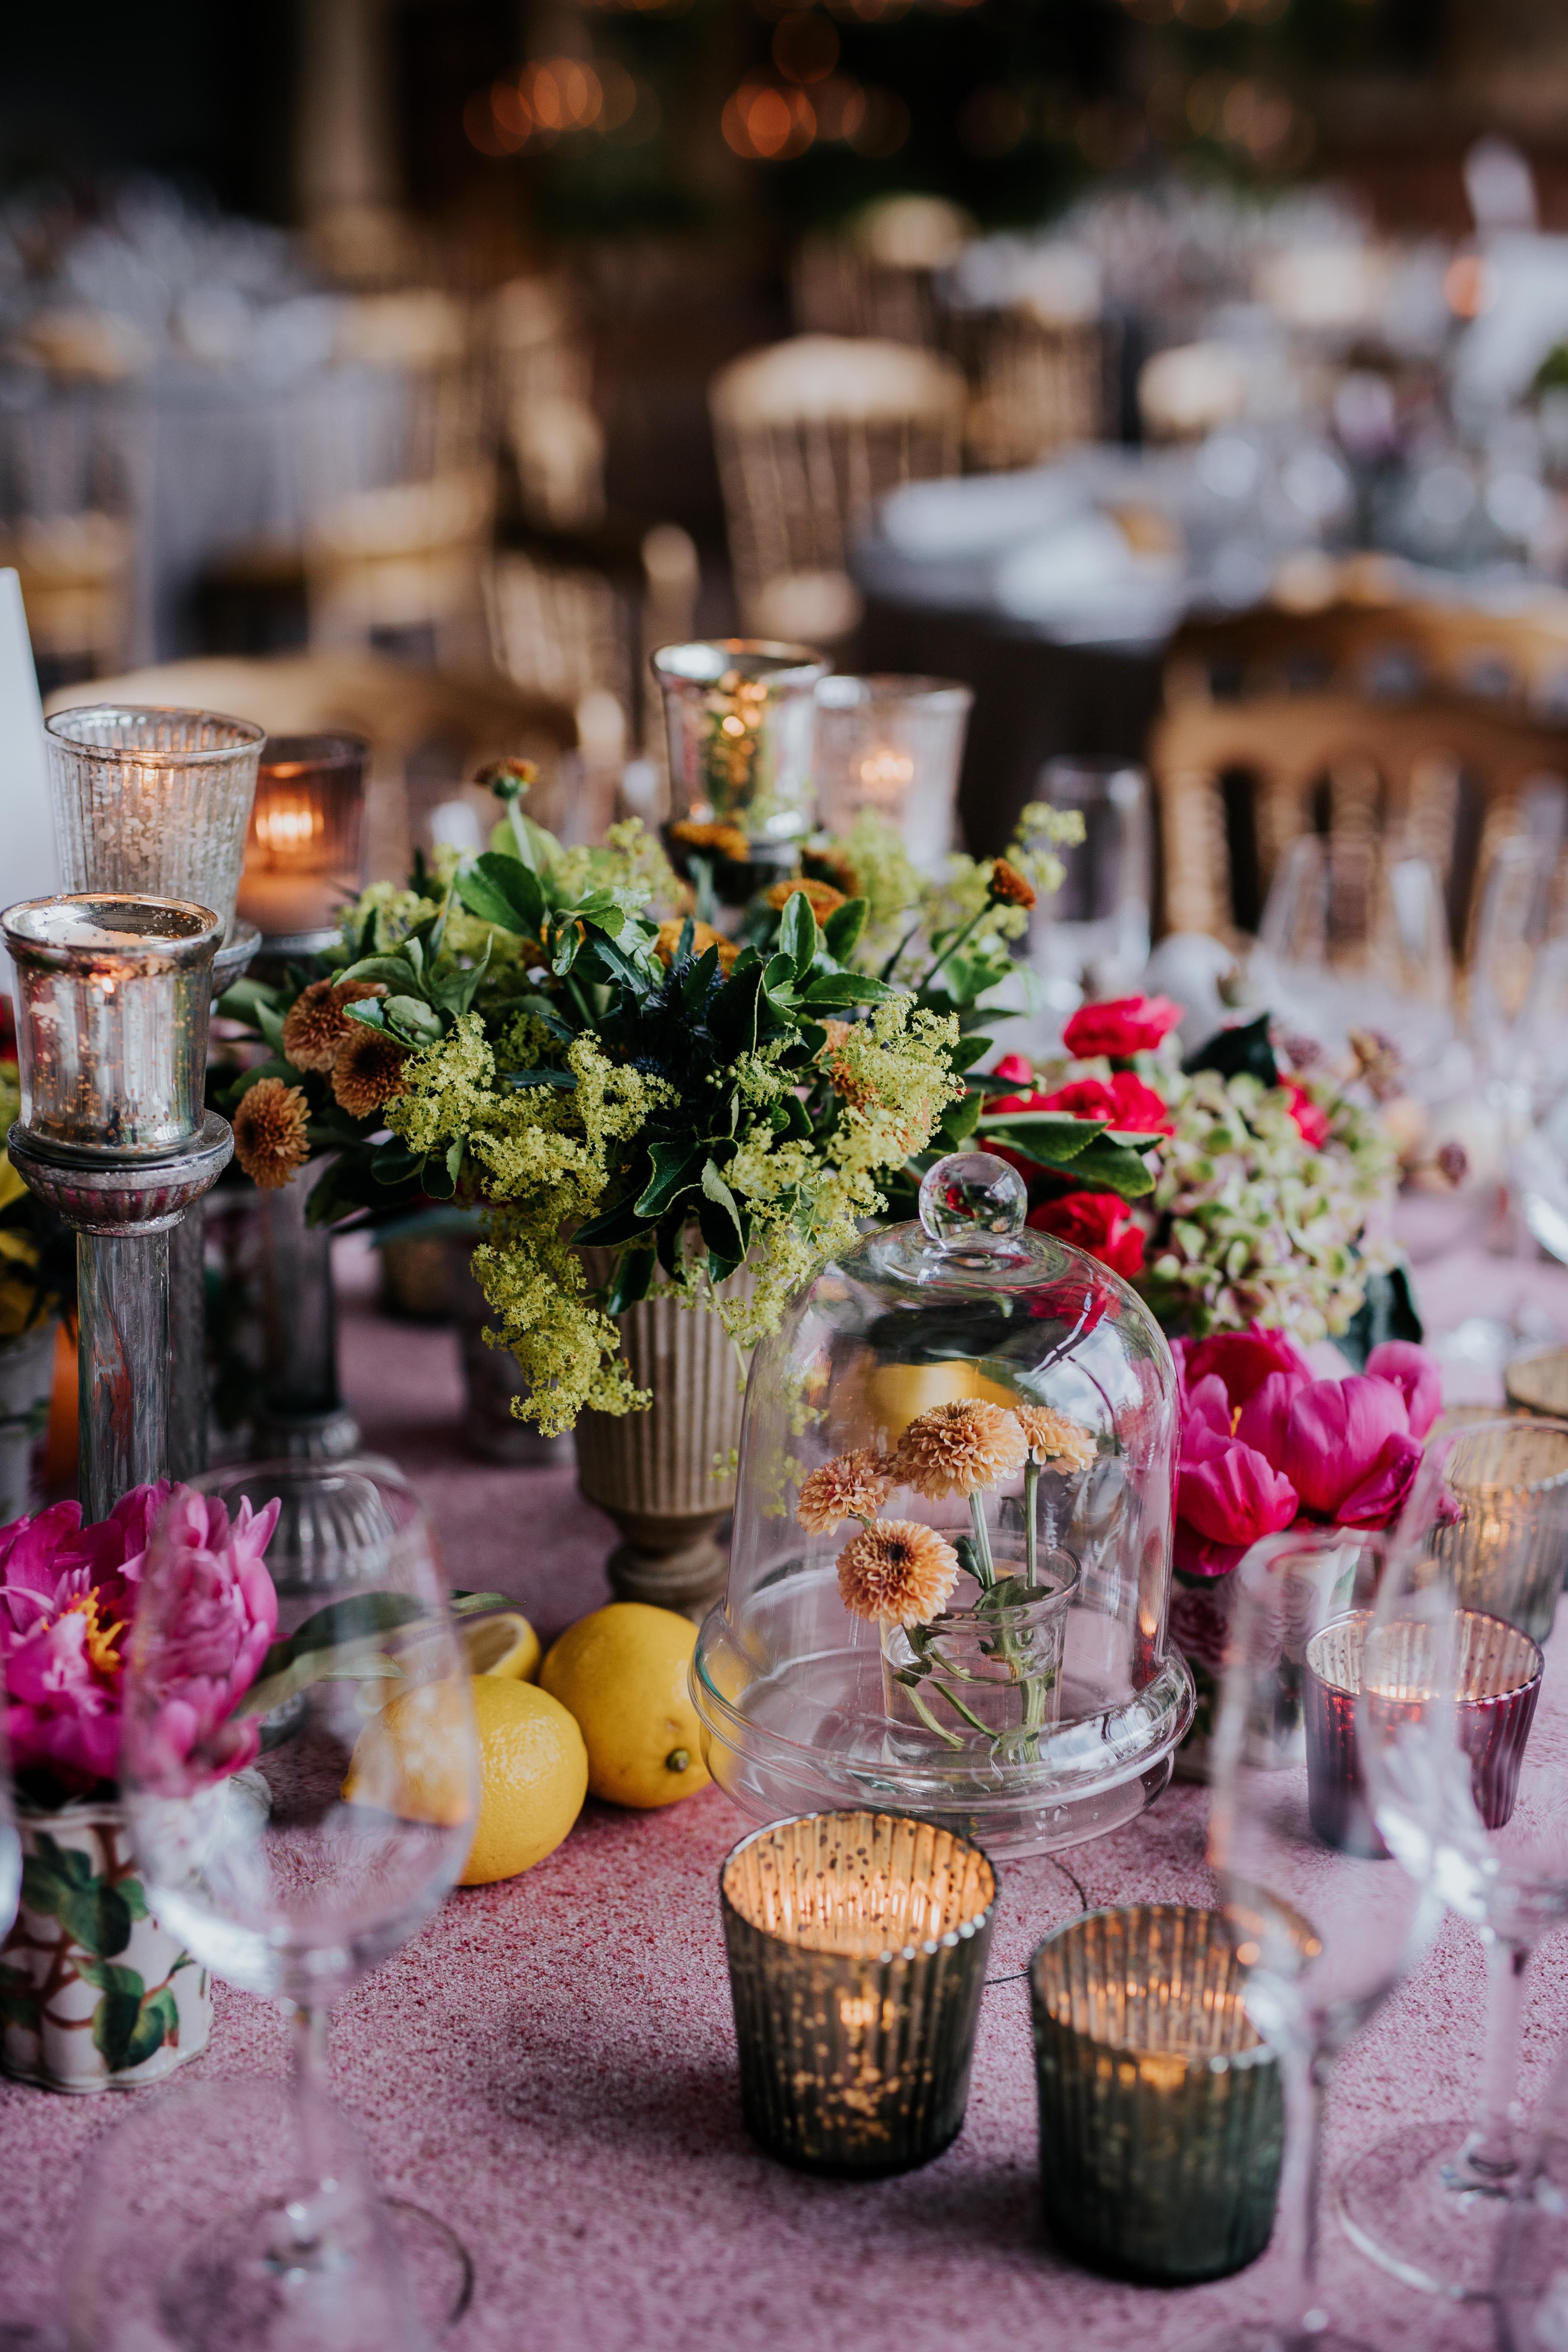 La boda de los mil detalles